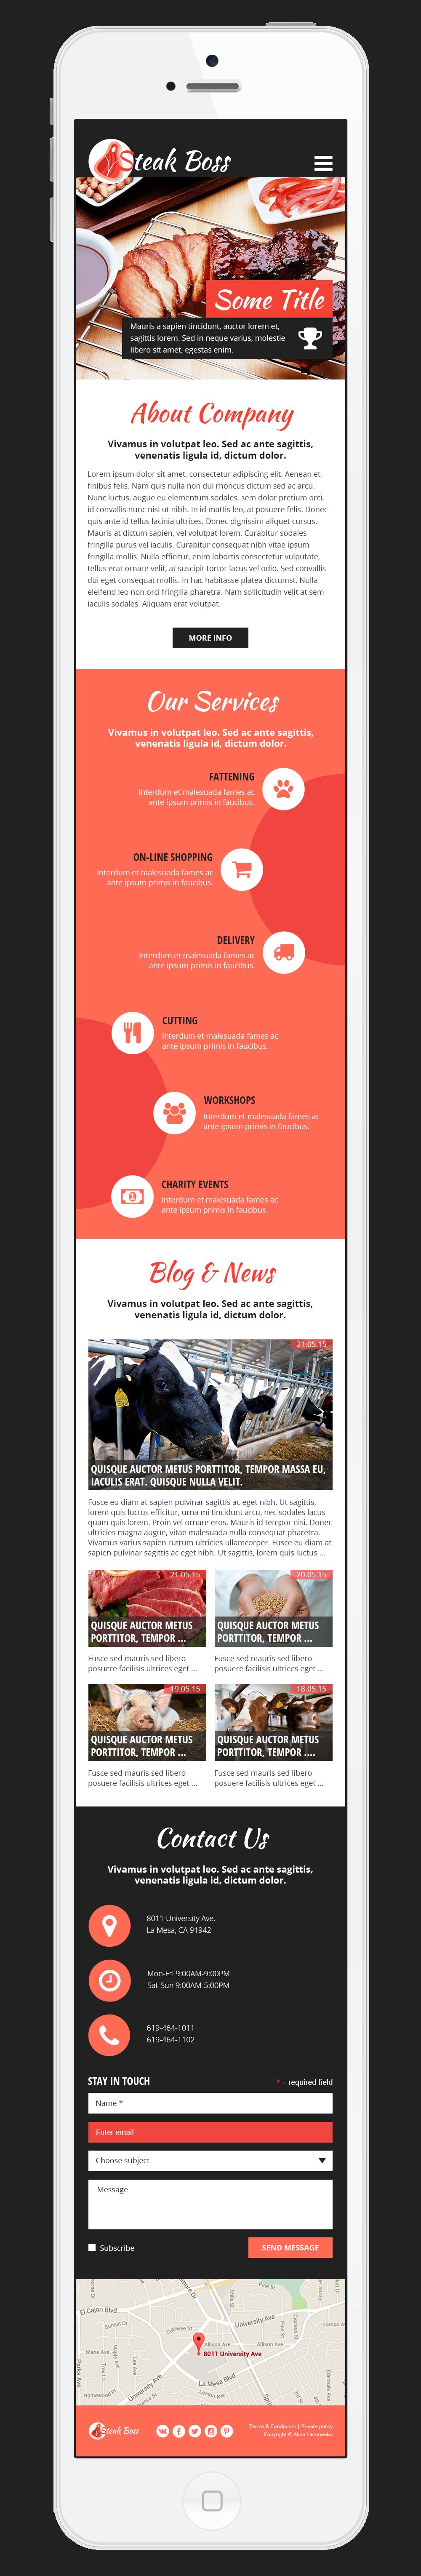 design homepage landing page steak boss mobile design